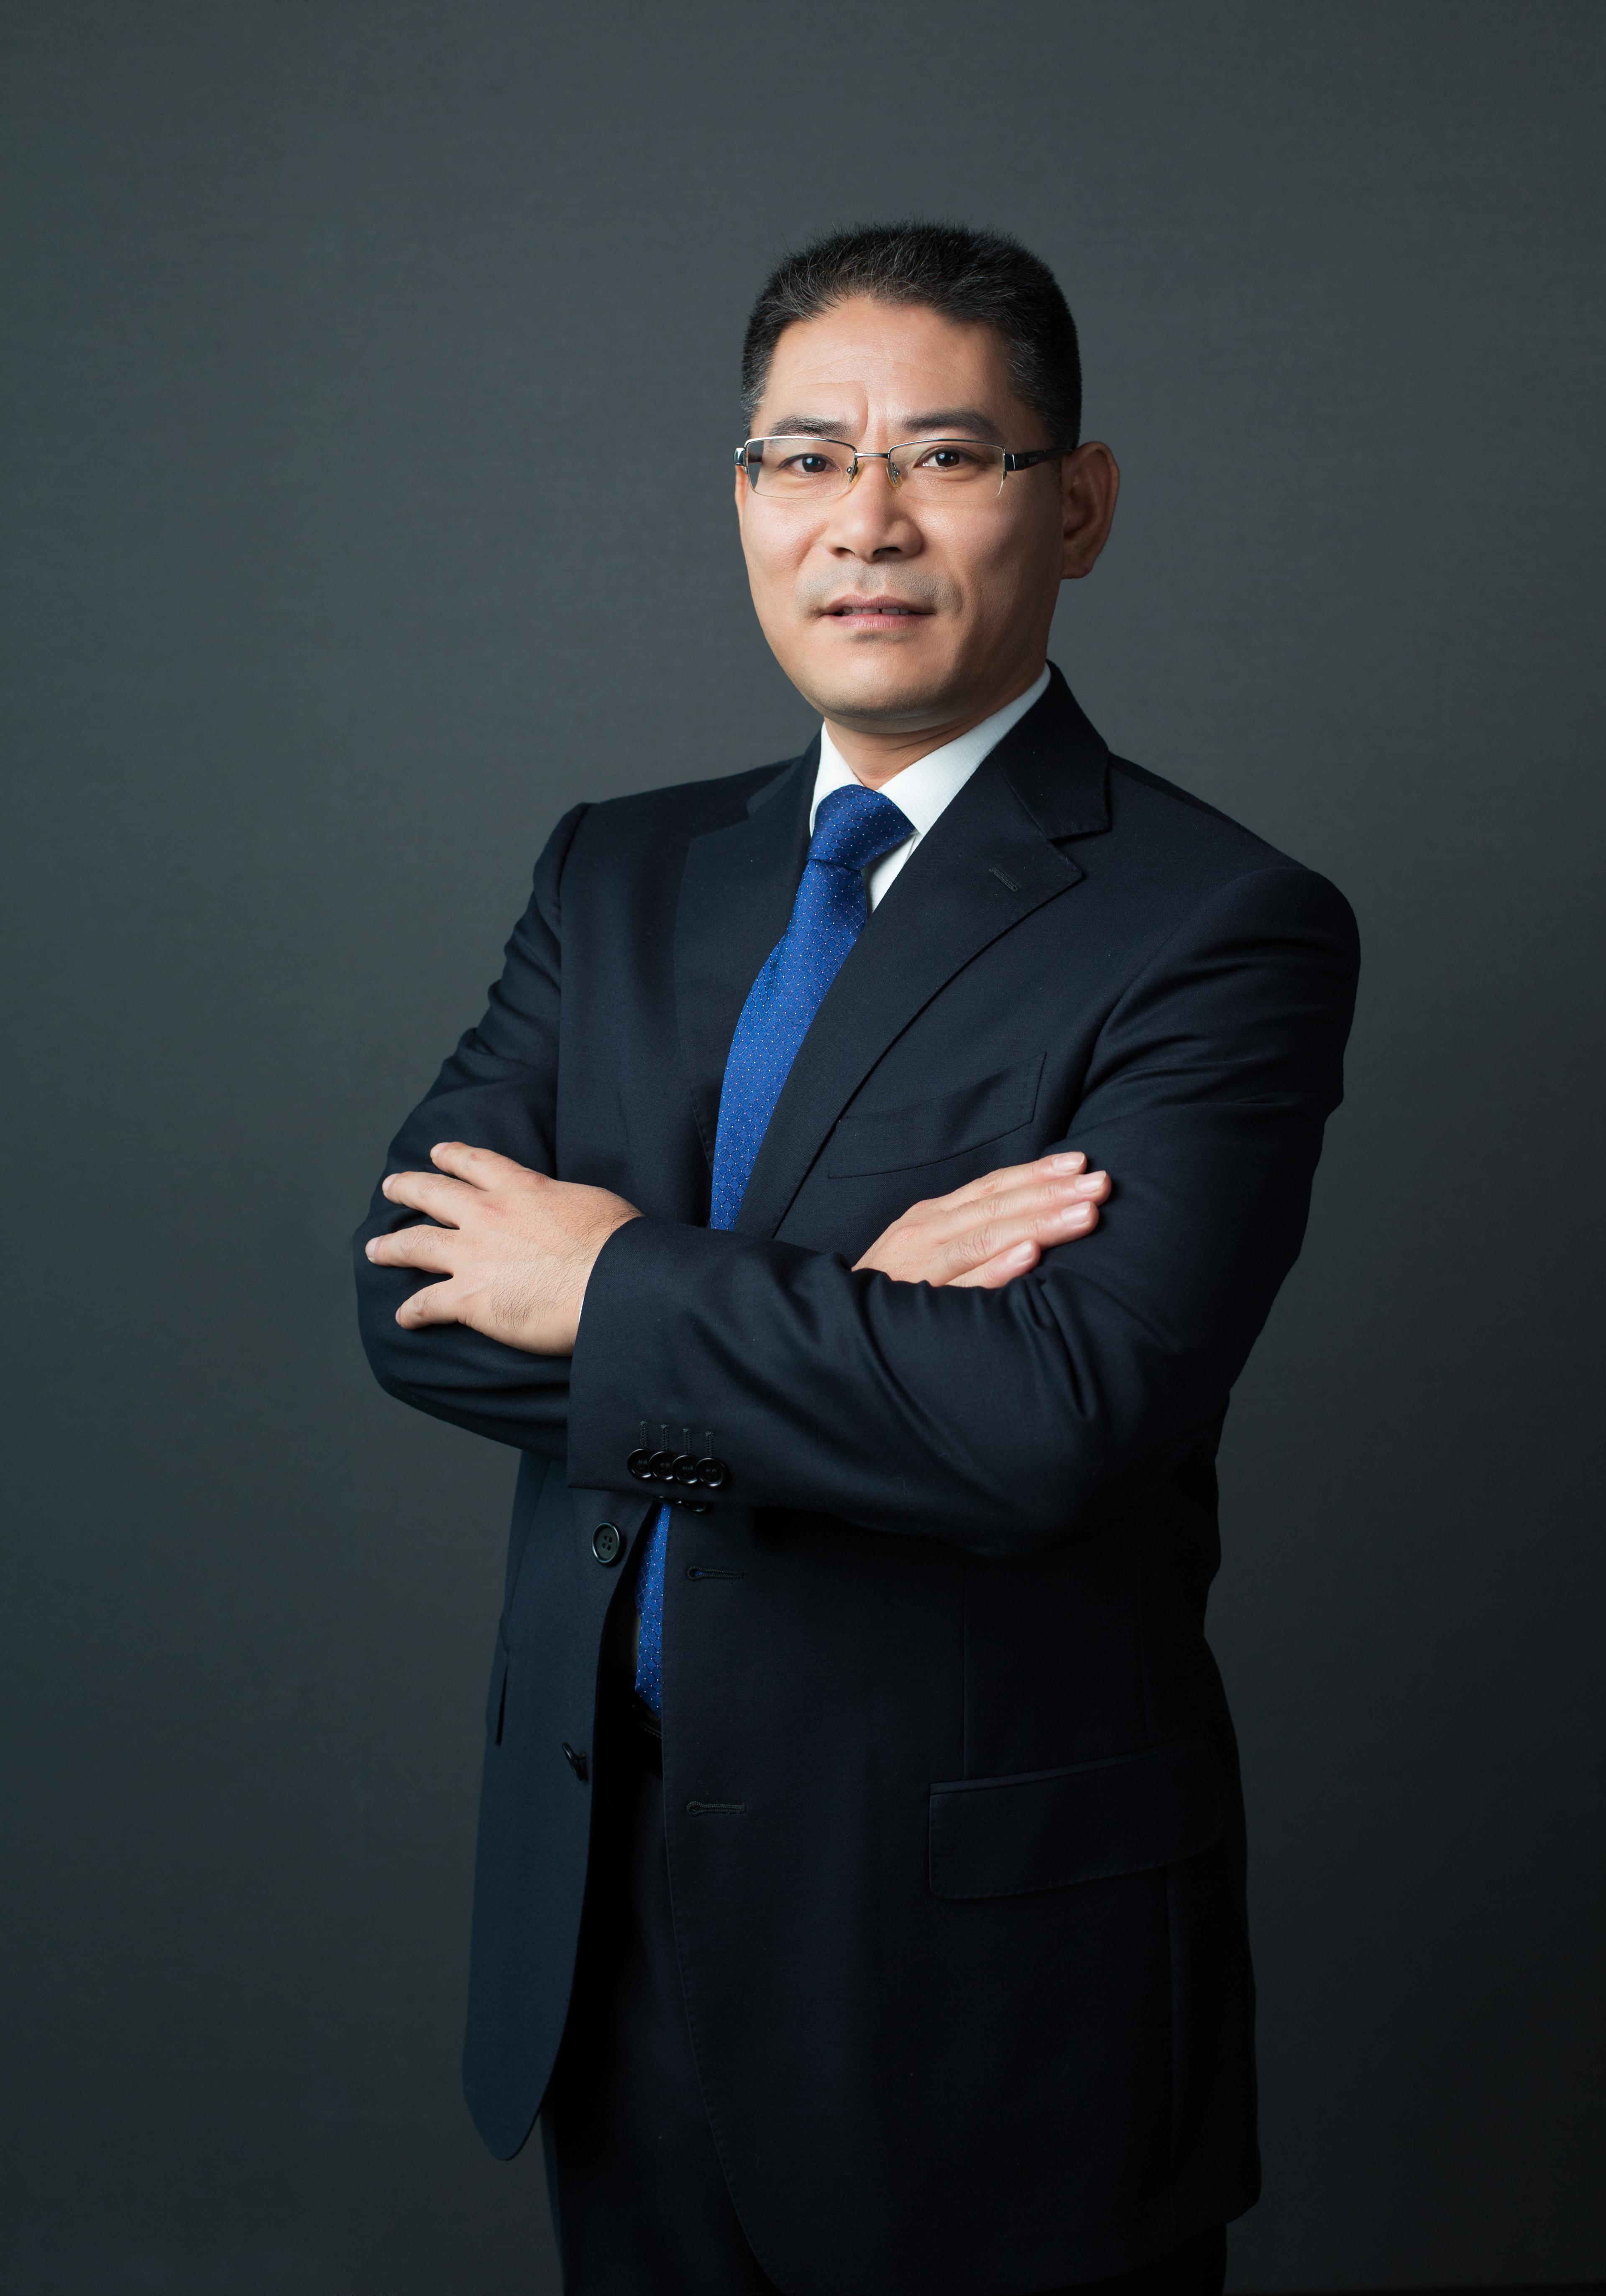 徐廉政(Lianzheng Xu)